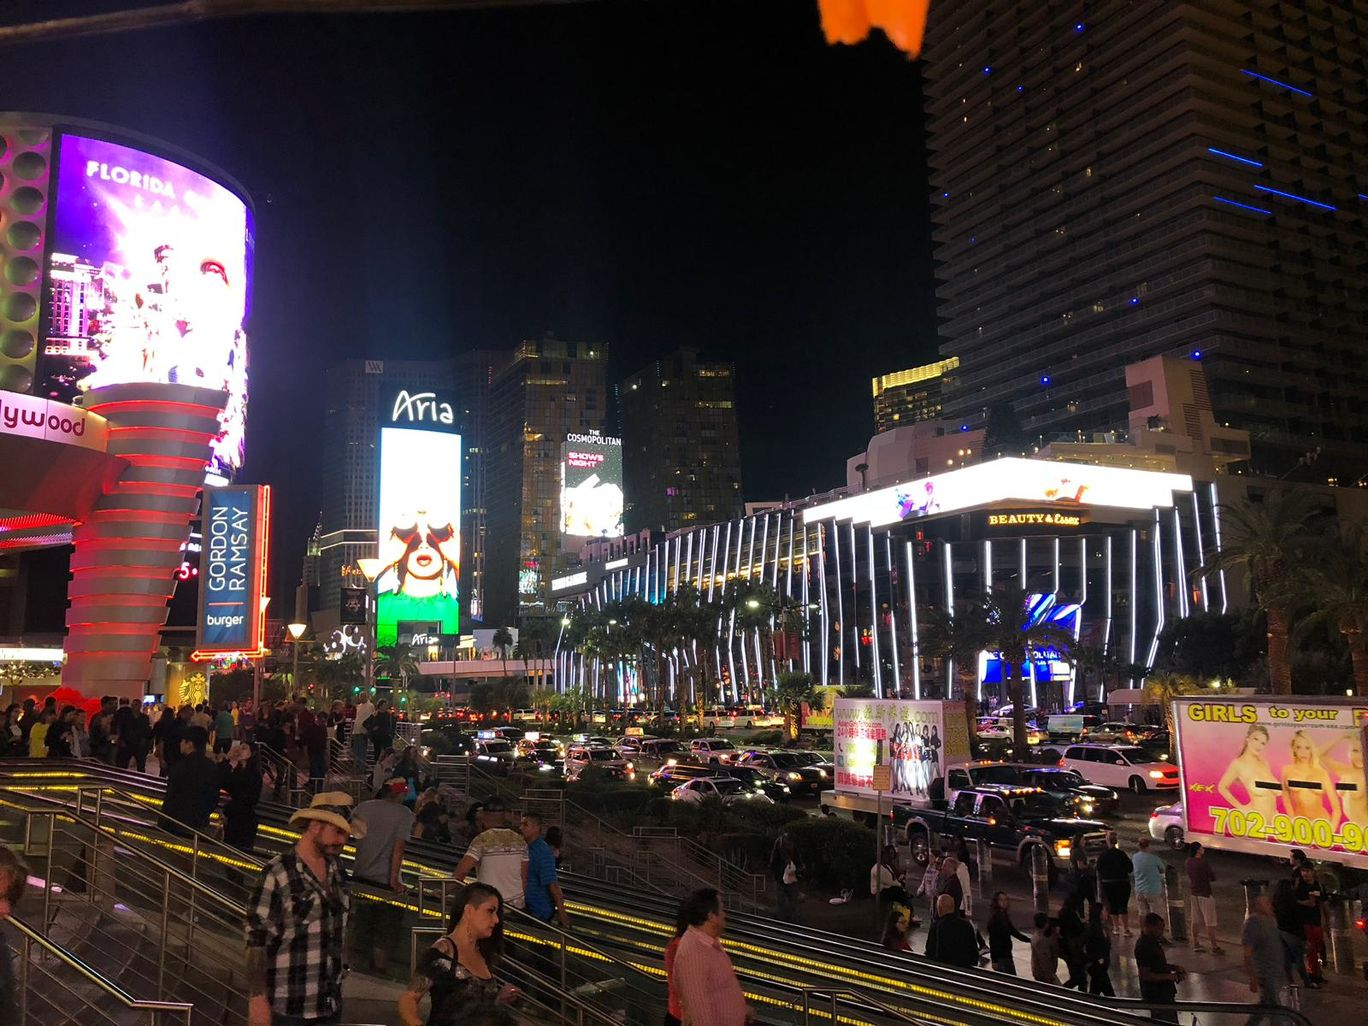 Photo of Las Vegas, NV By HarryCutFilms (Harry)